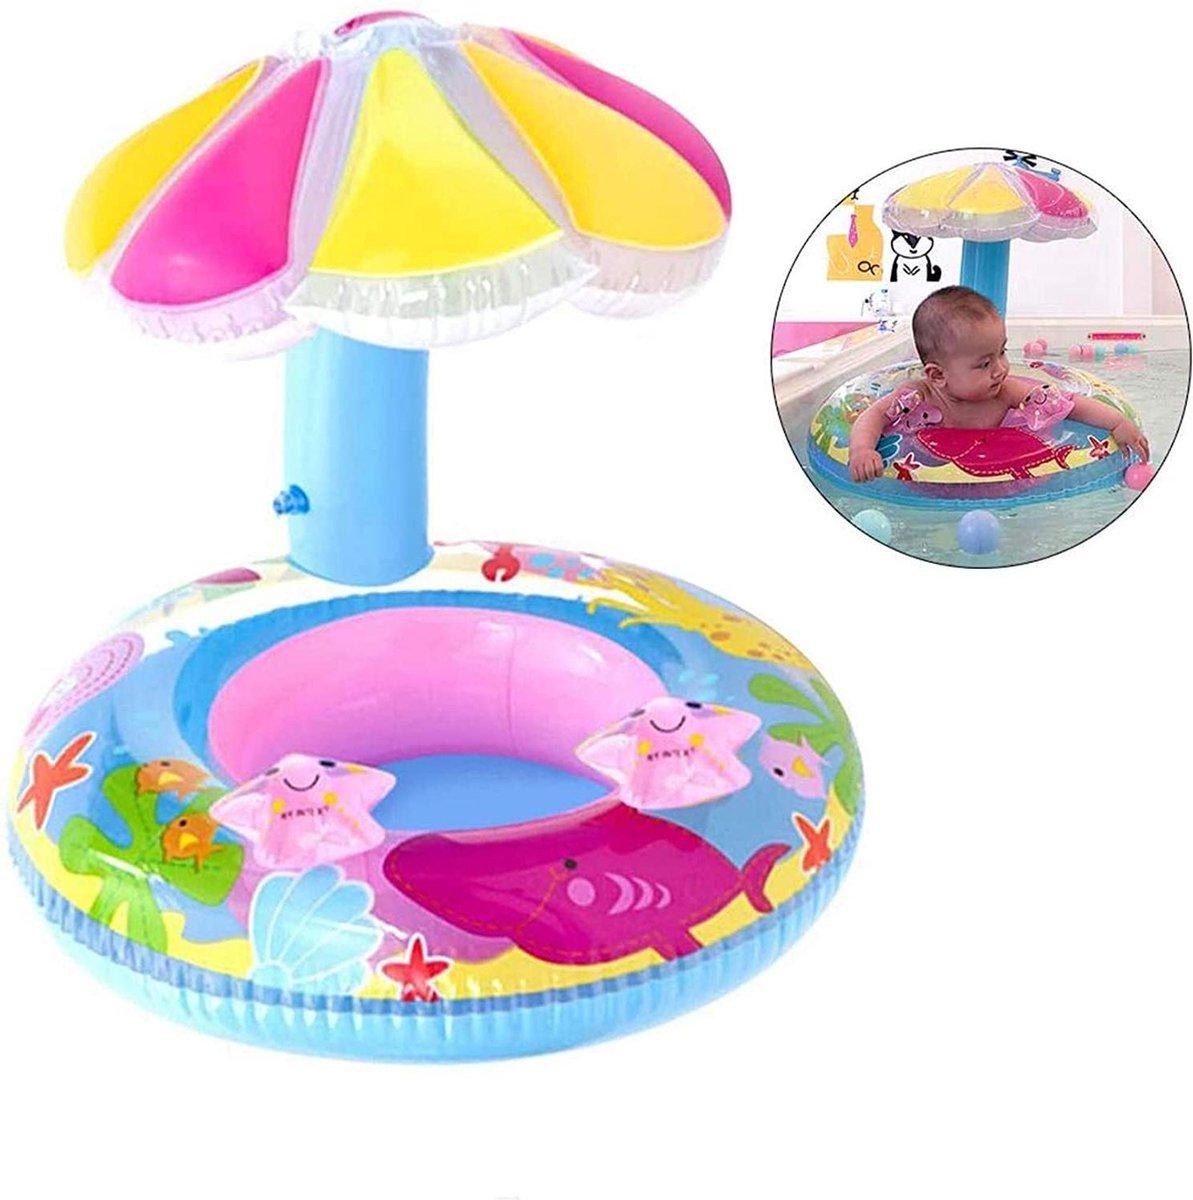 Babyzwemring met zonnedak - Baby float - Opblaasbare kinderboot - Zwemhulp babyzwembad - Opblaasbare zwemring - Zwemstoel